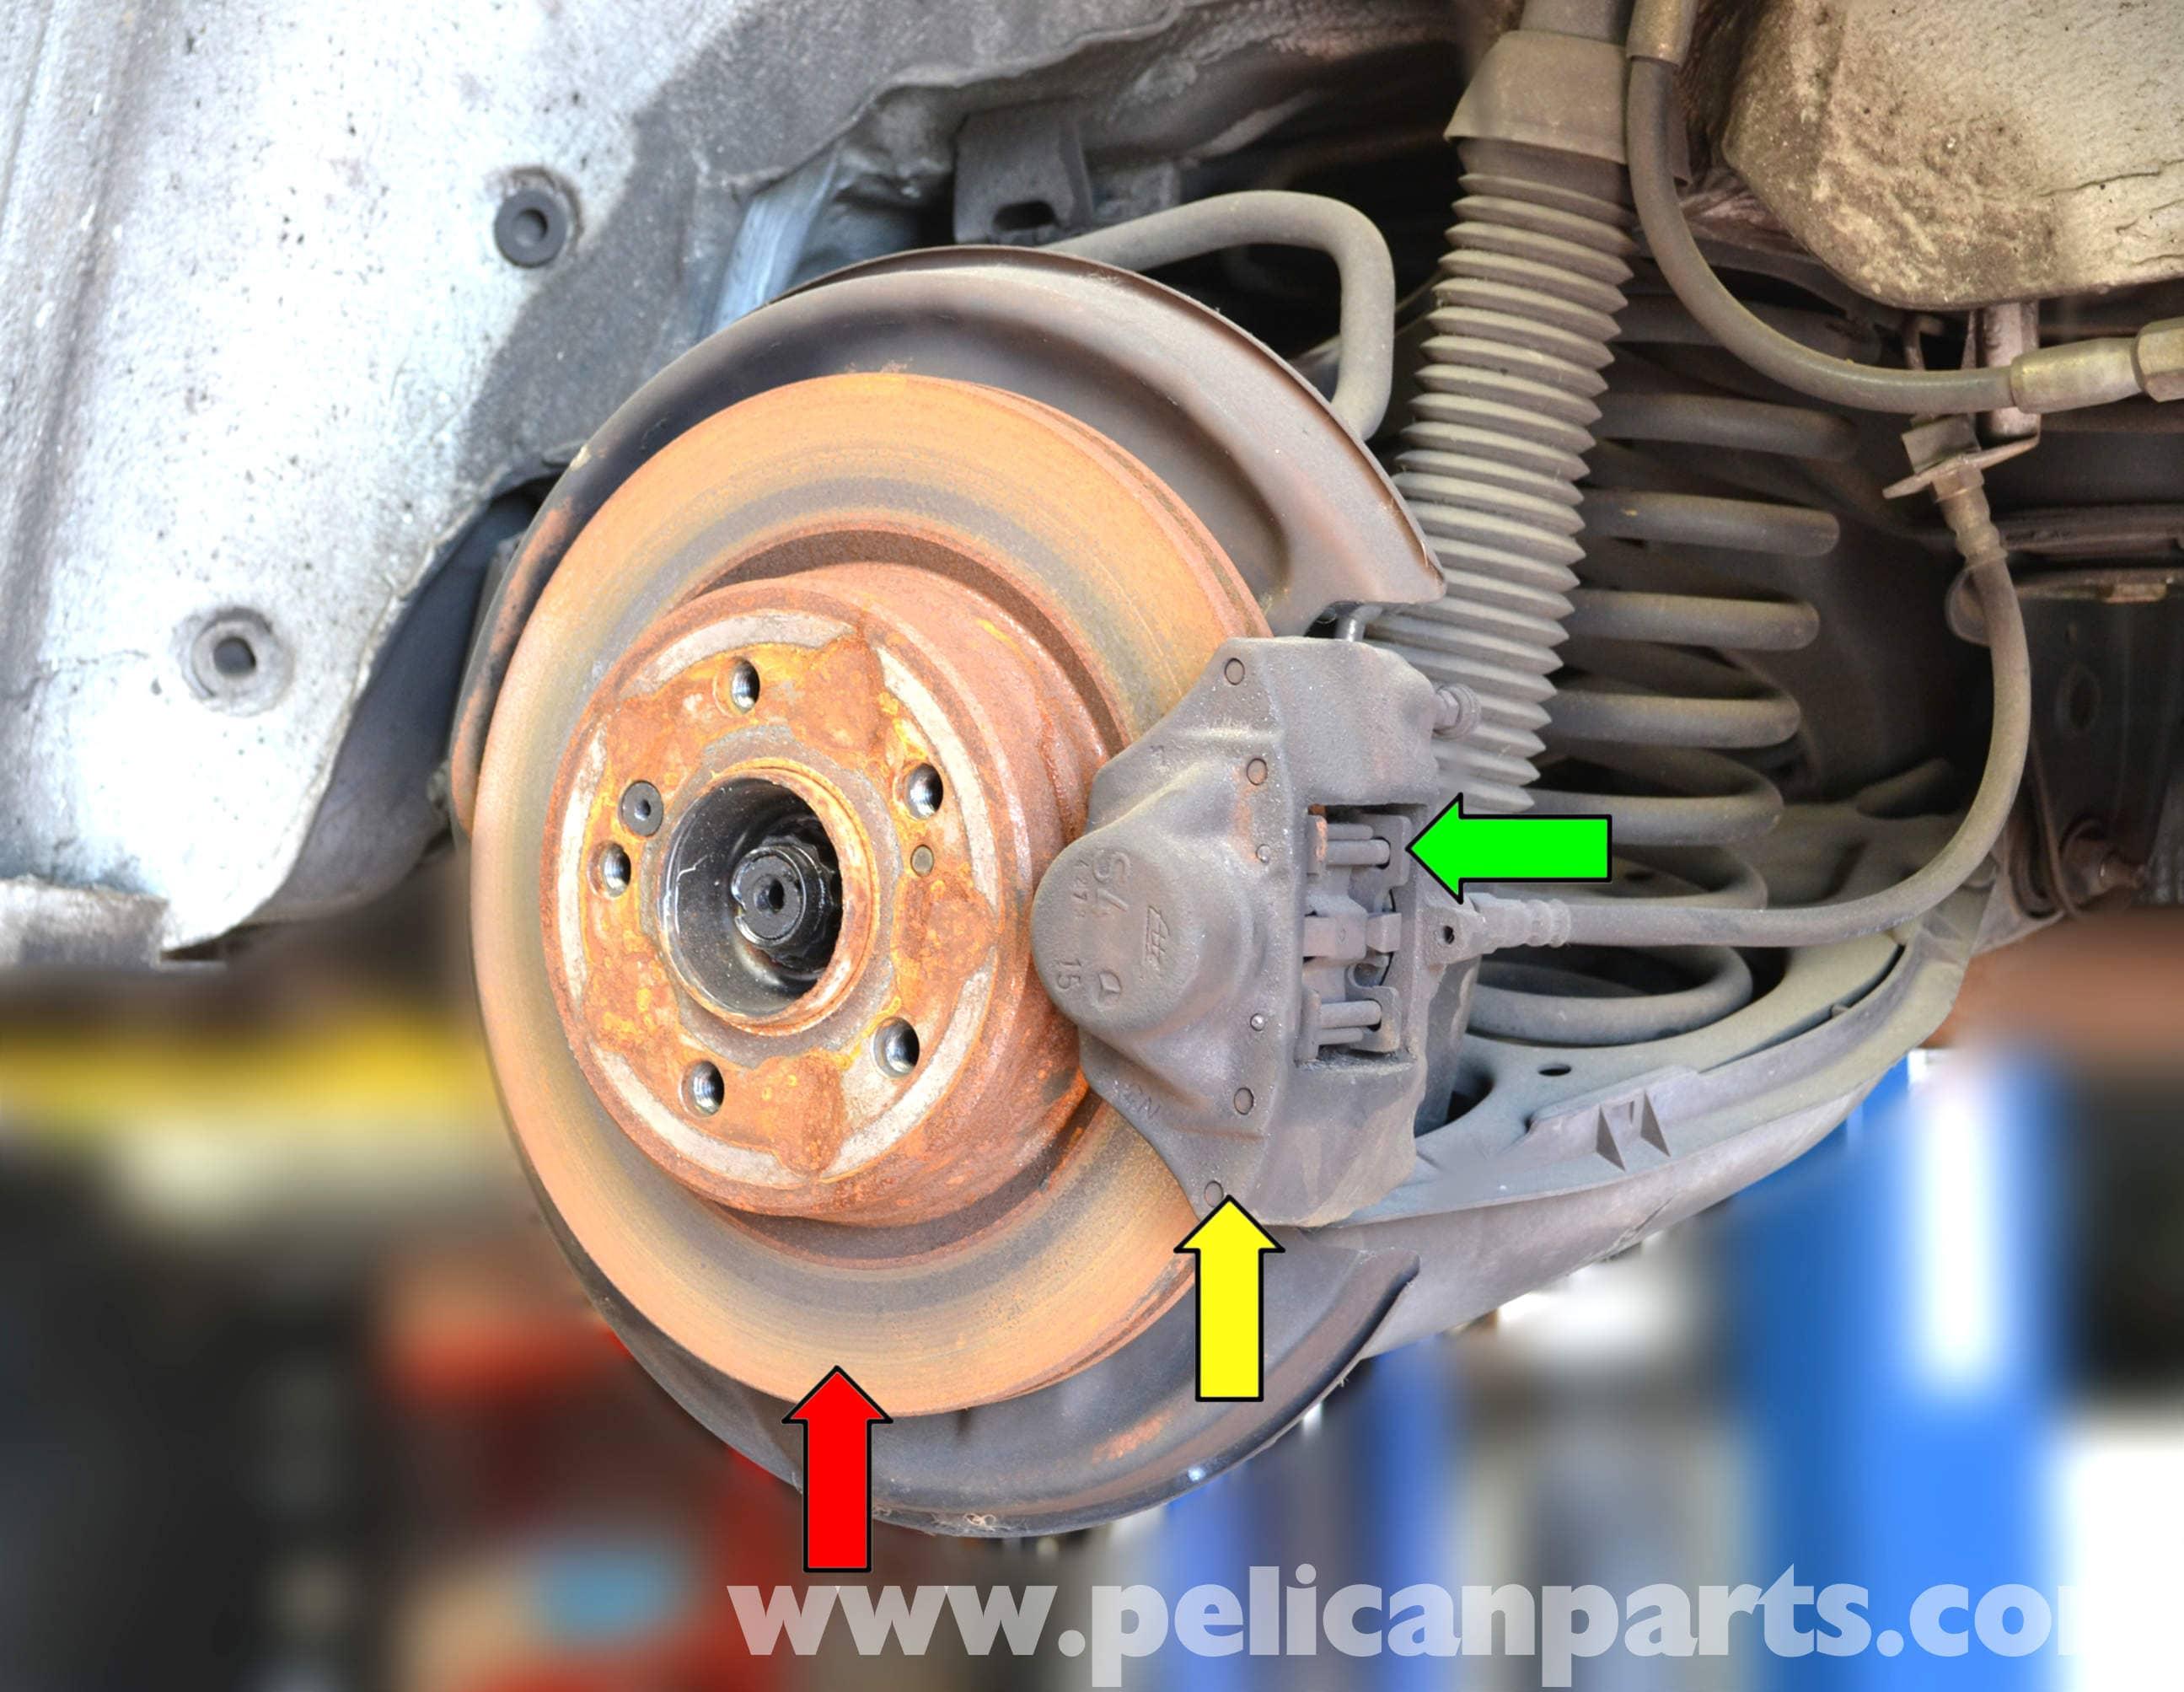 Mercedes benz w124 rear brake caliper replacement 1986 for Mercedes benz c300 brake rotors